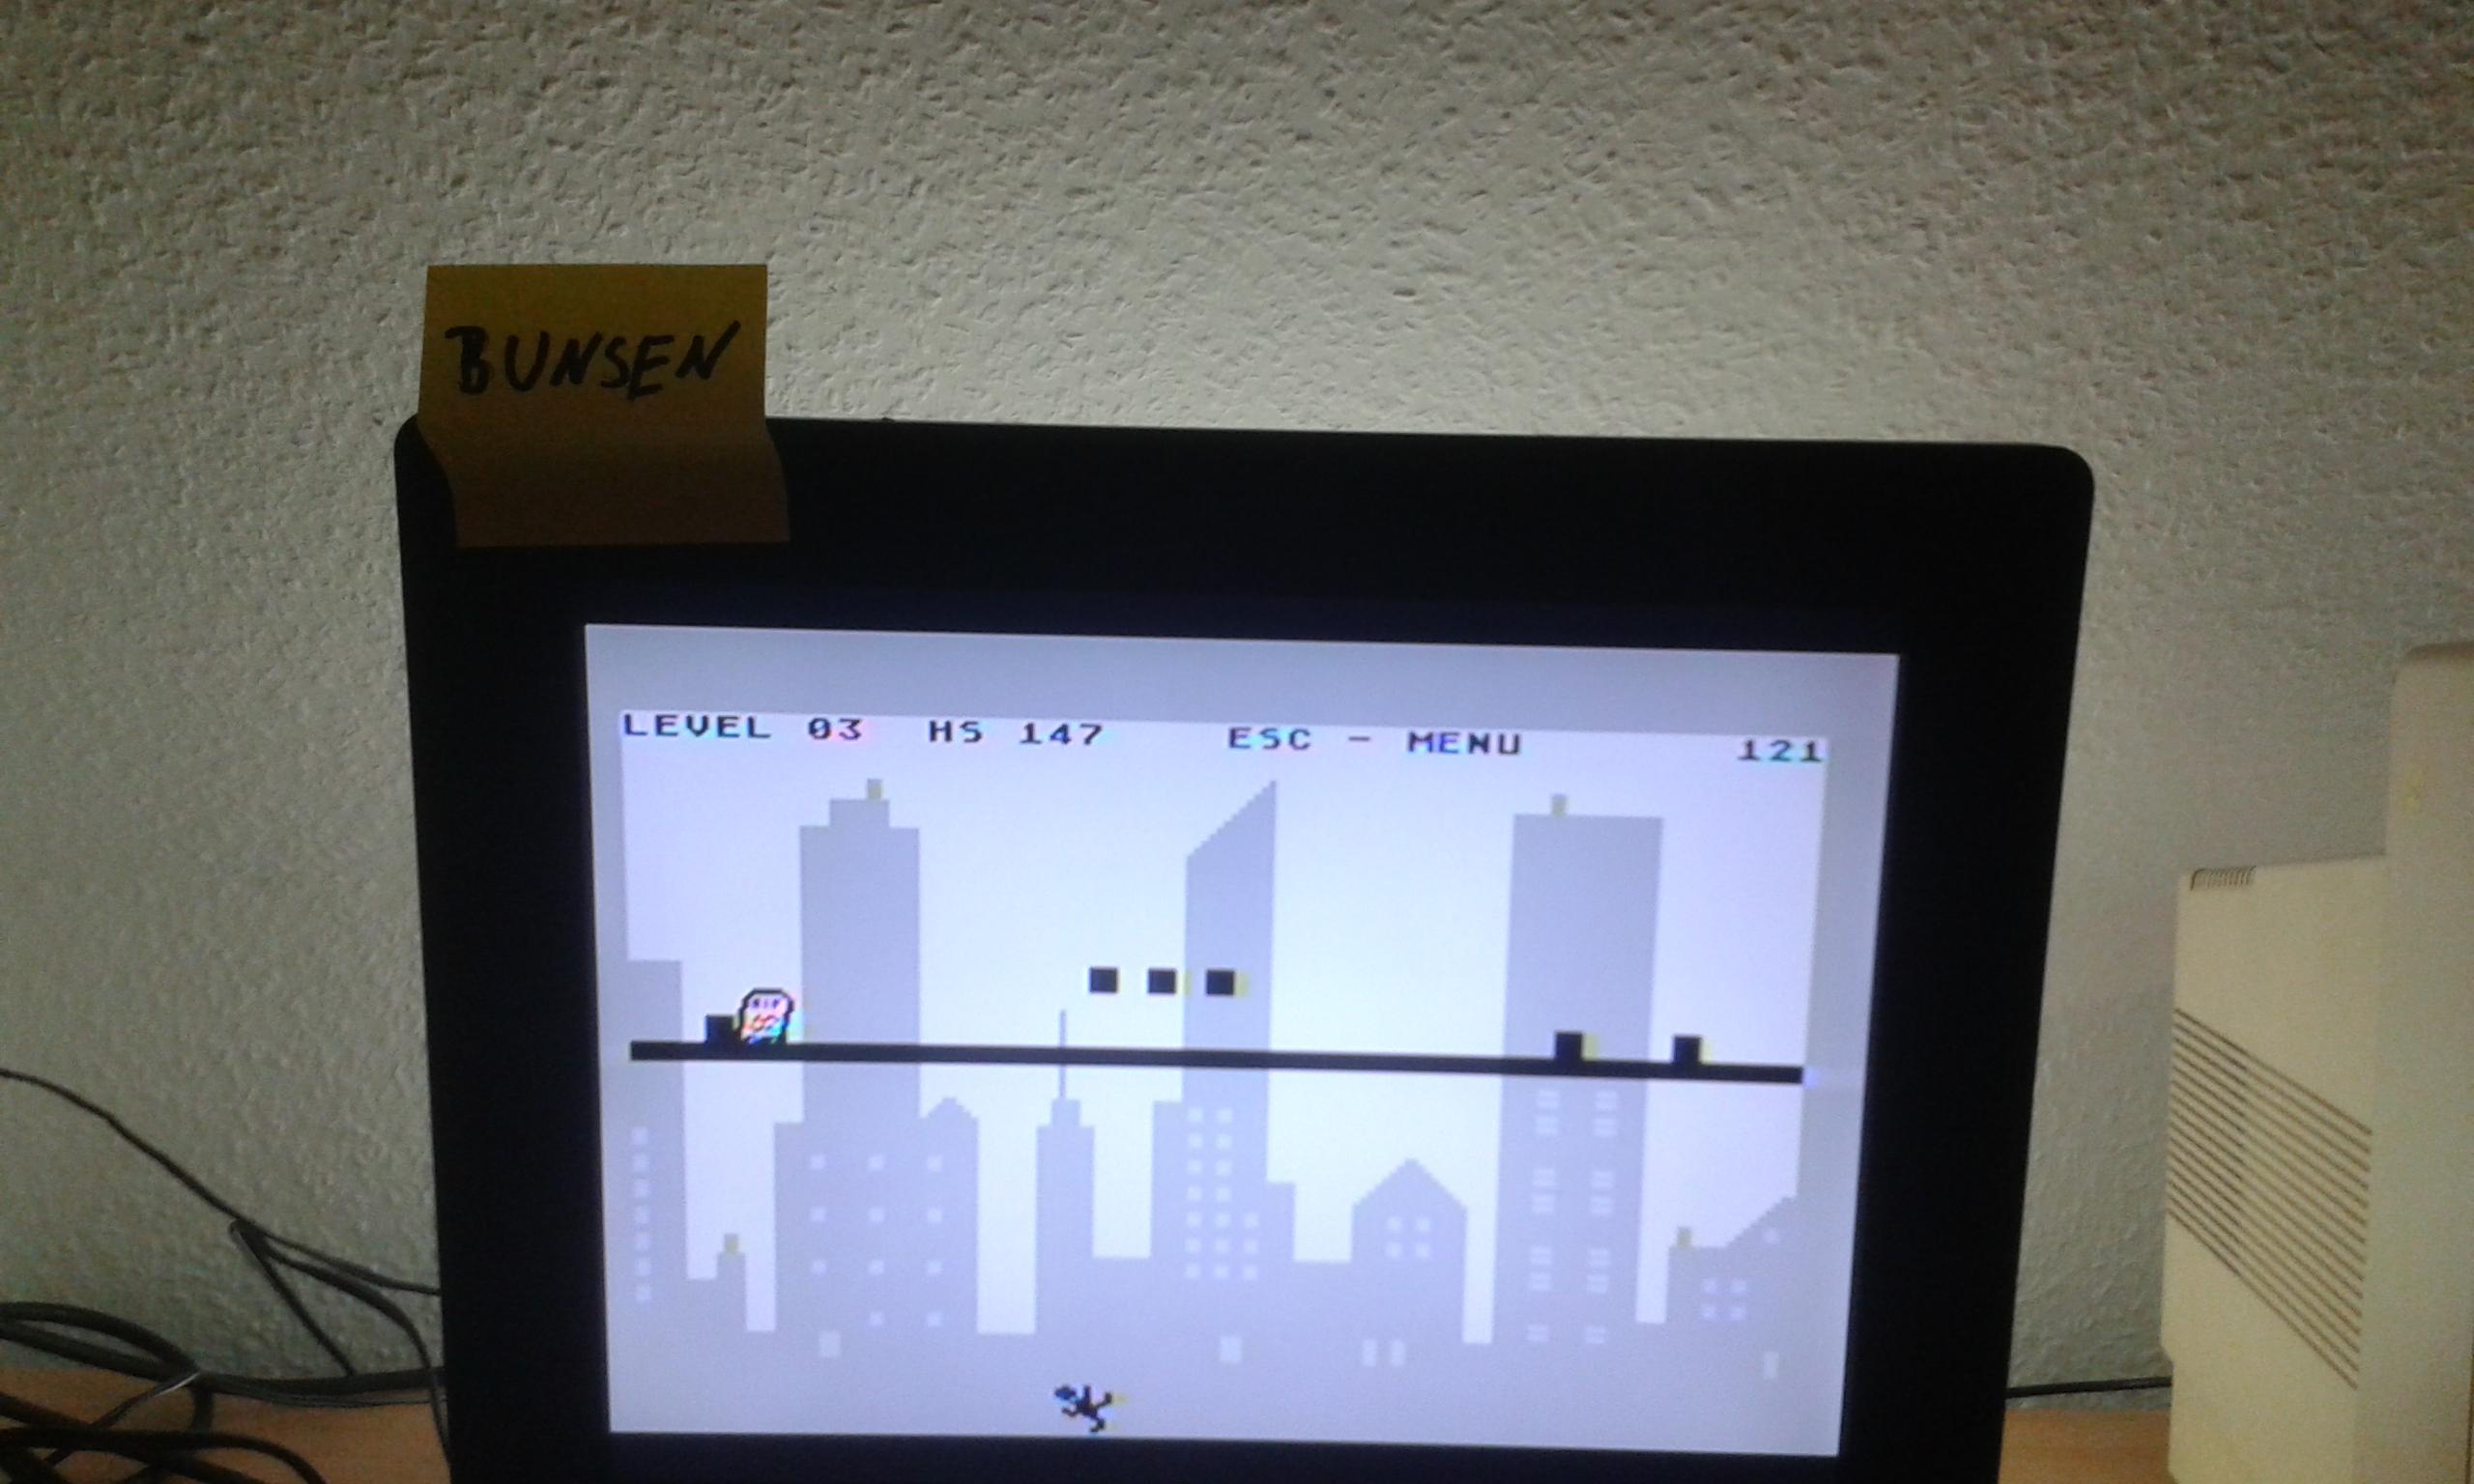 Bunsen: Line Runner (Atari 400/800/XL/XE) 3,147 points on 2014-10-26 14:53:01